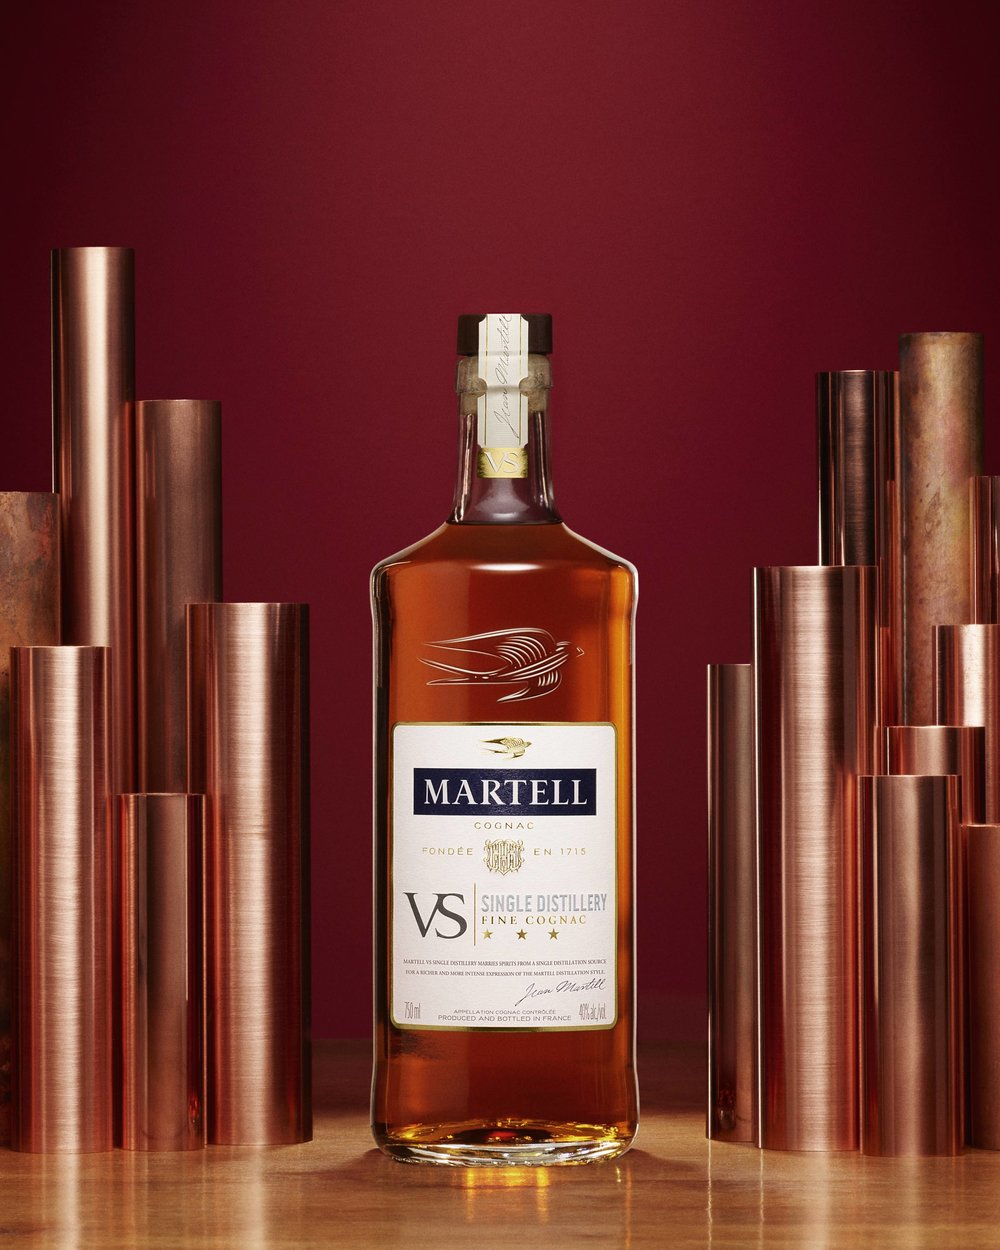 Martell Cognac VS Single Distillery Bottle .jpg